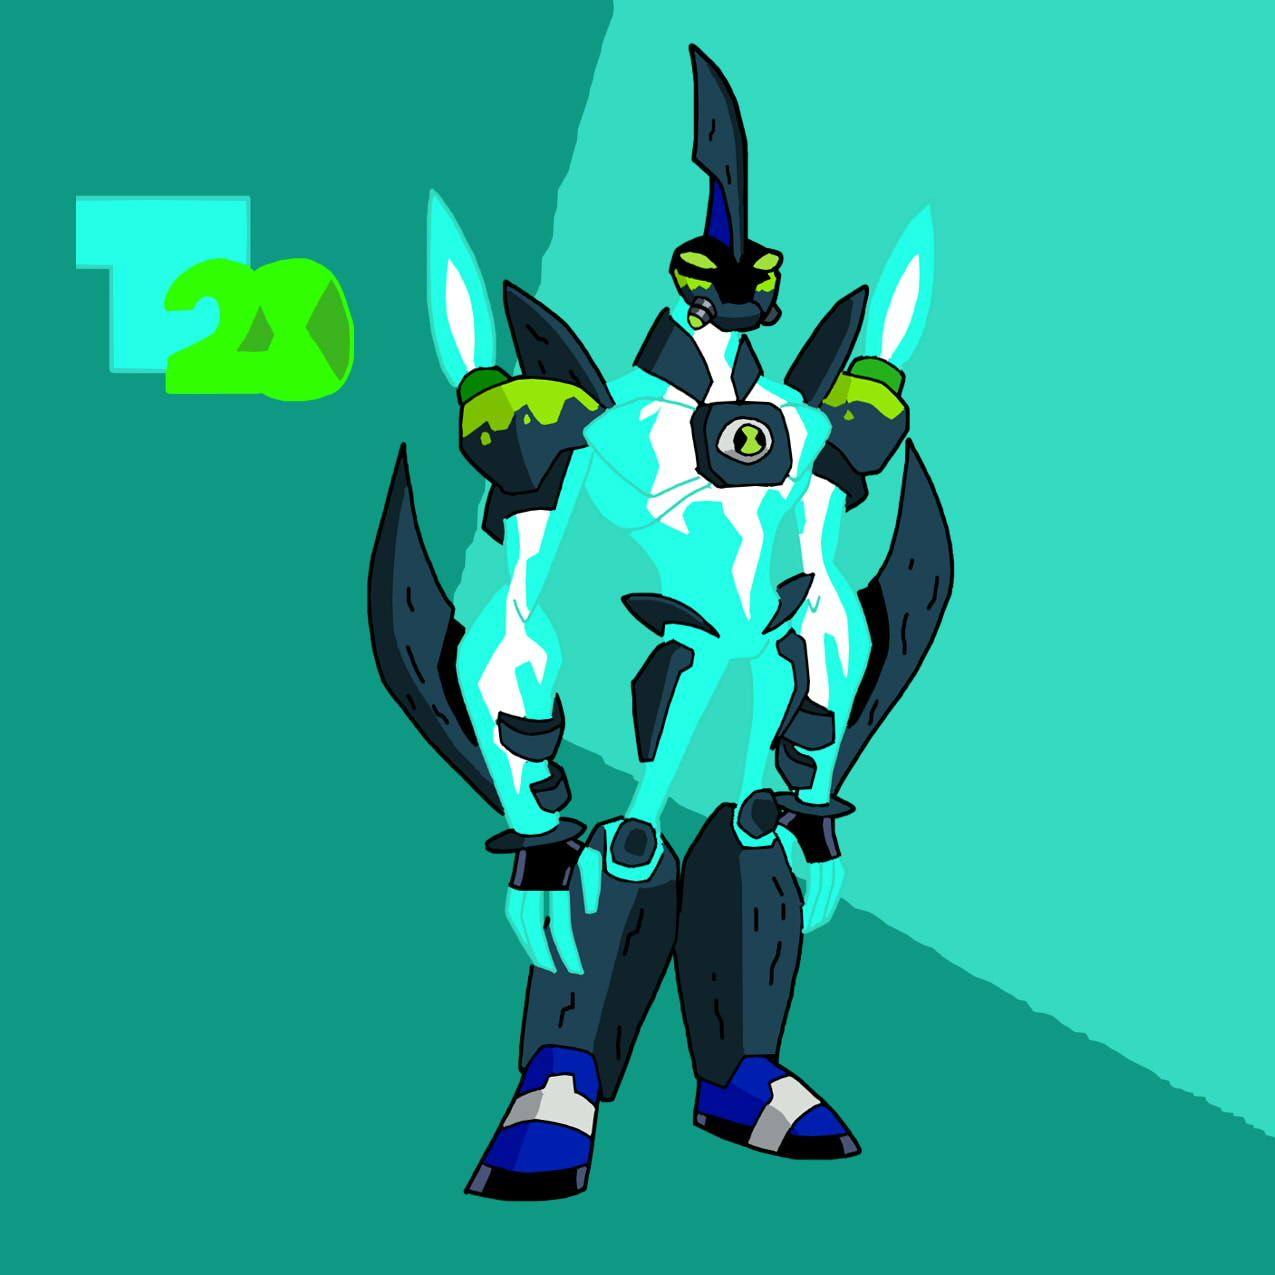 Way Shock Rock By Teo20120 On Deviantart Robot Concept Art Artist Ben 10 Ultimate Alien